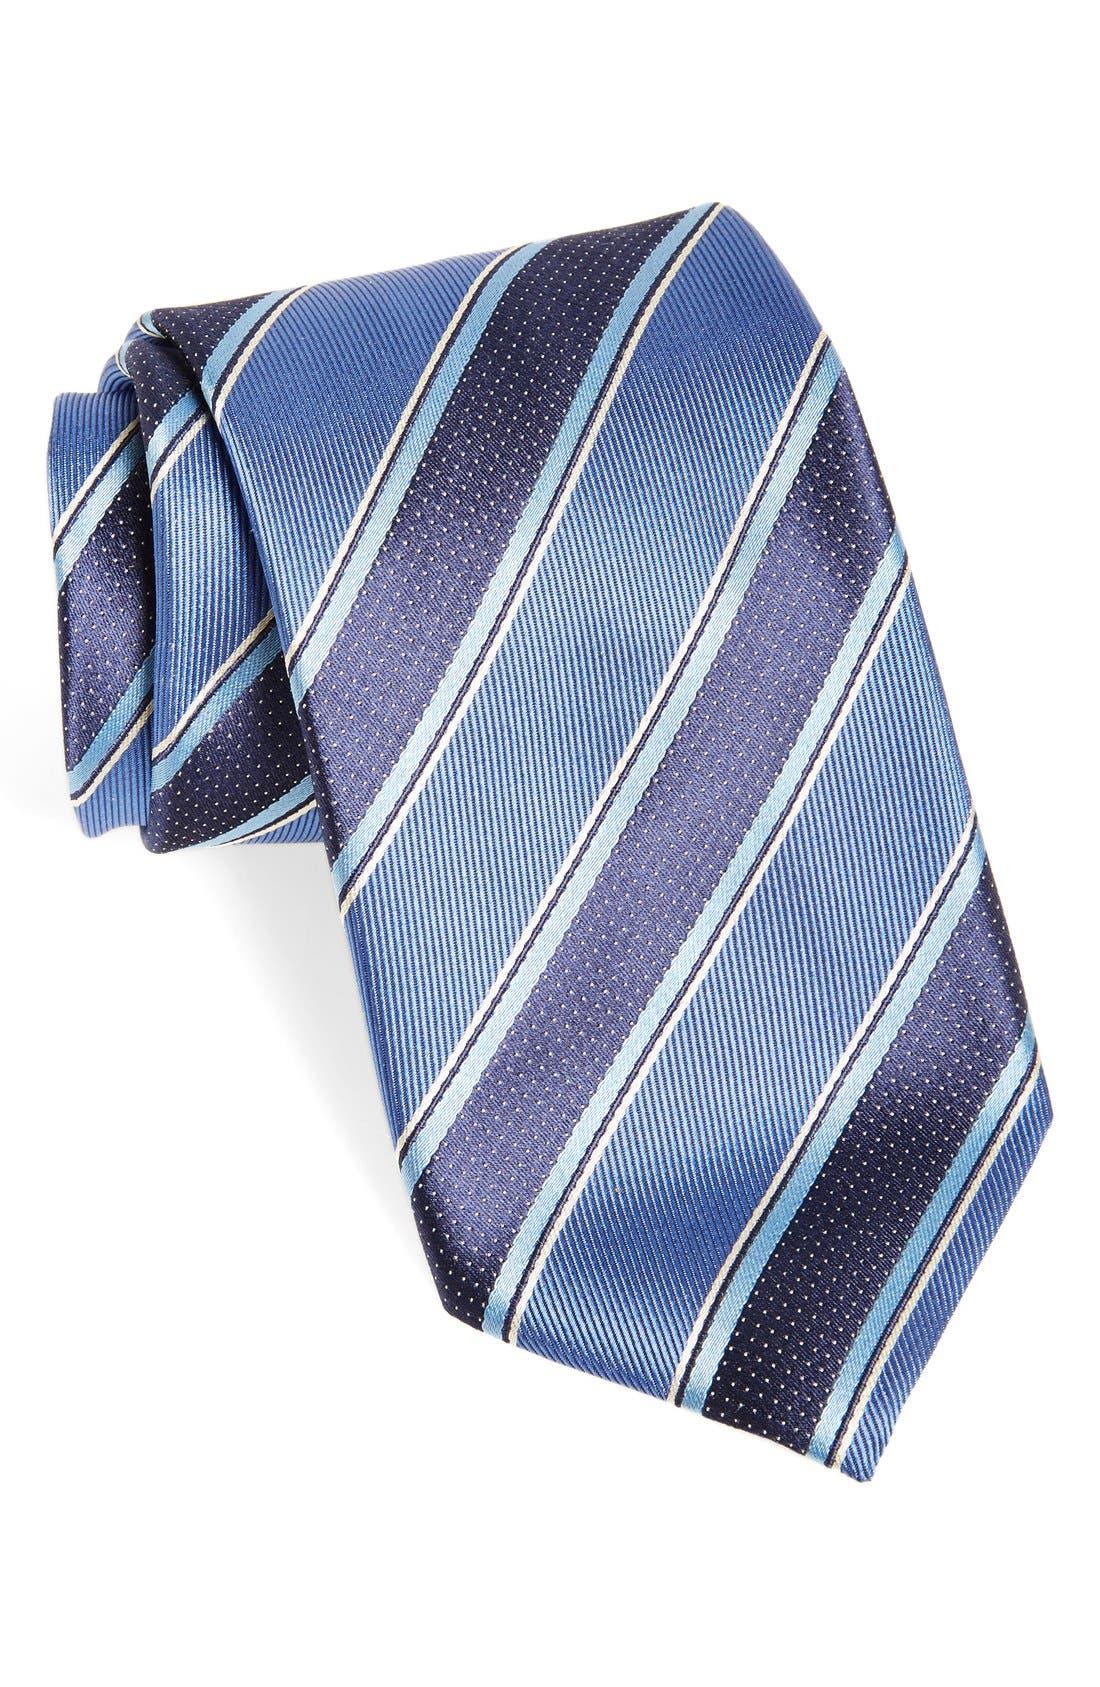 Alternate Image 1 Selected - Canali Stripe Woven Silk Tie